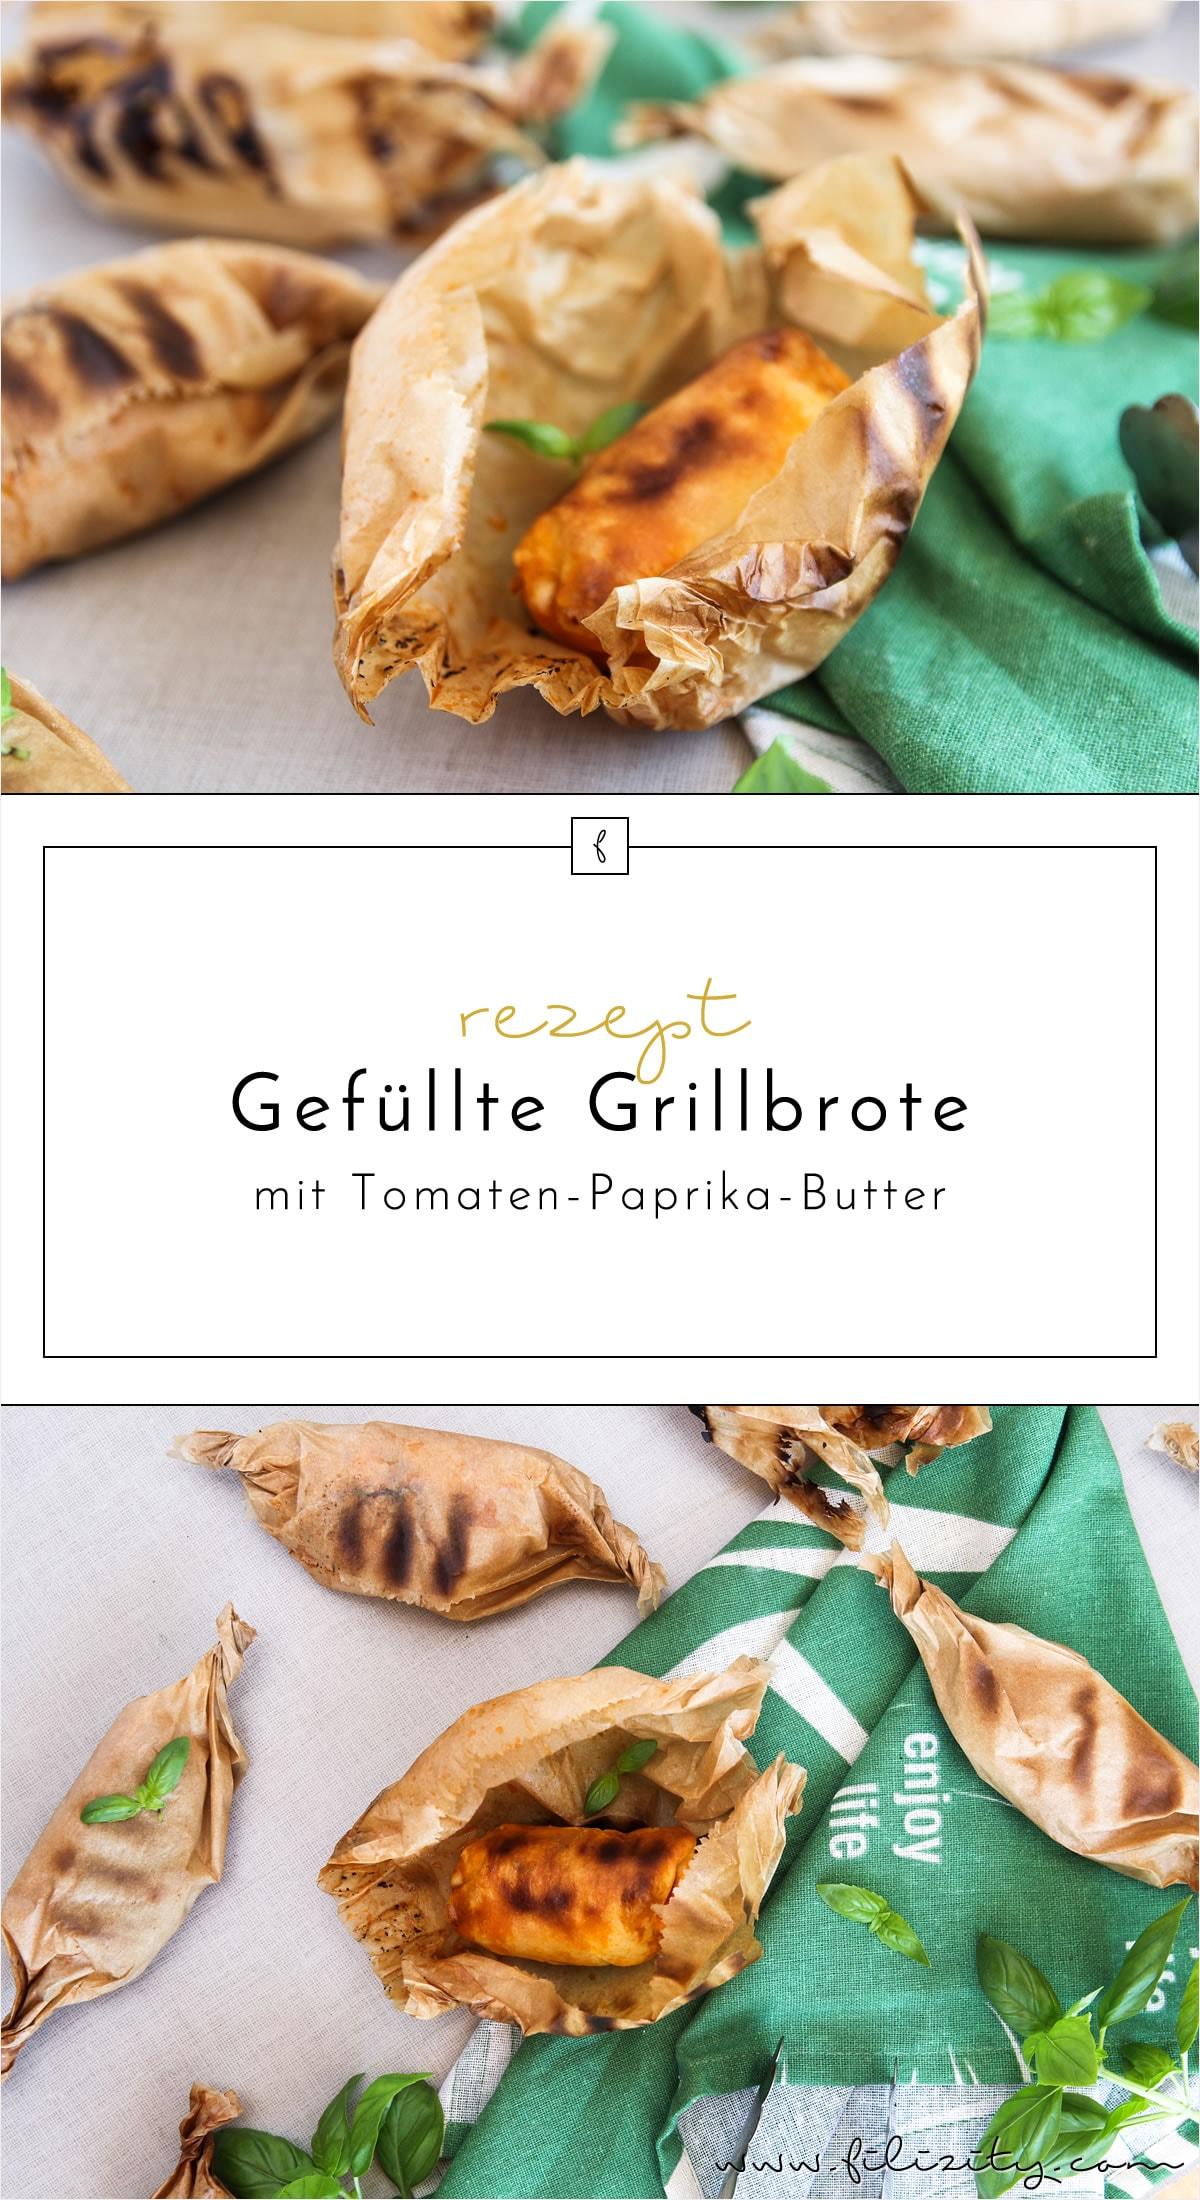 Sommer-Rezept: Gefüllte Grillbrote mit Tomaten-Paprika-Butter